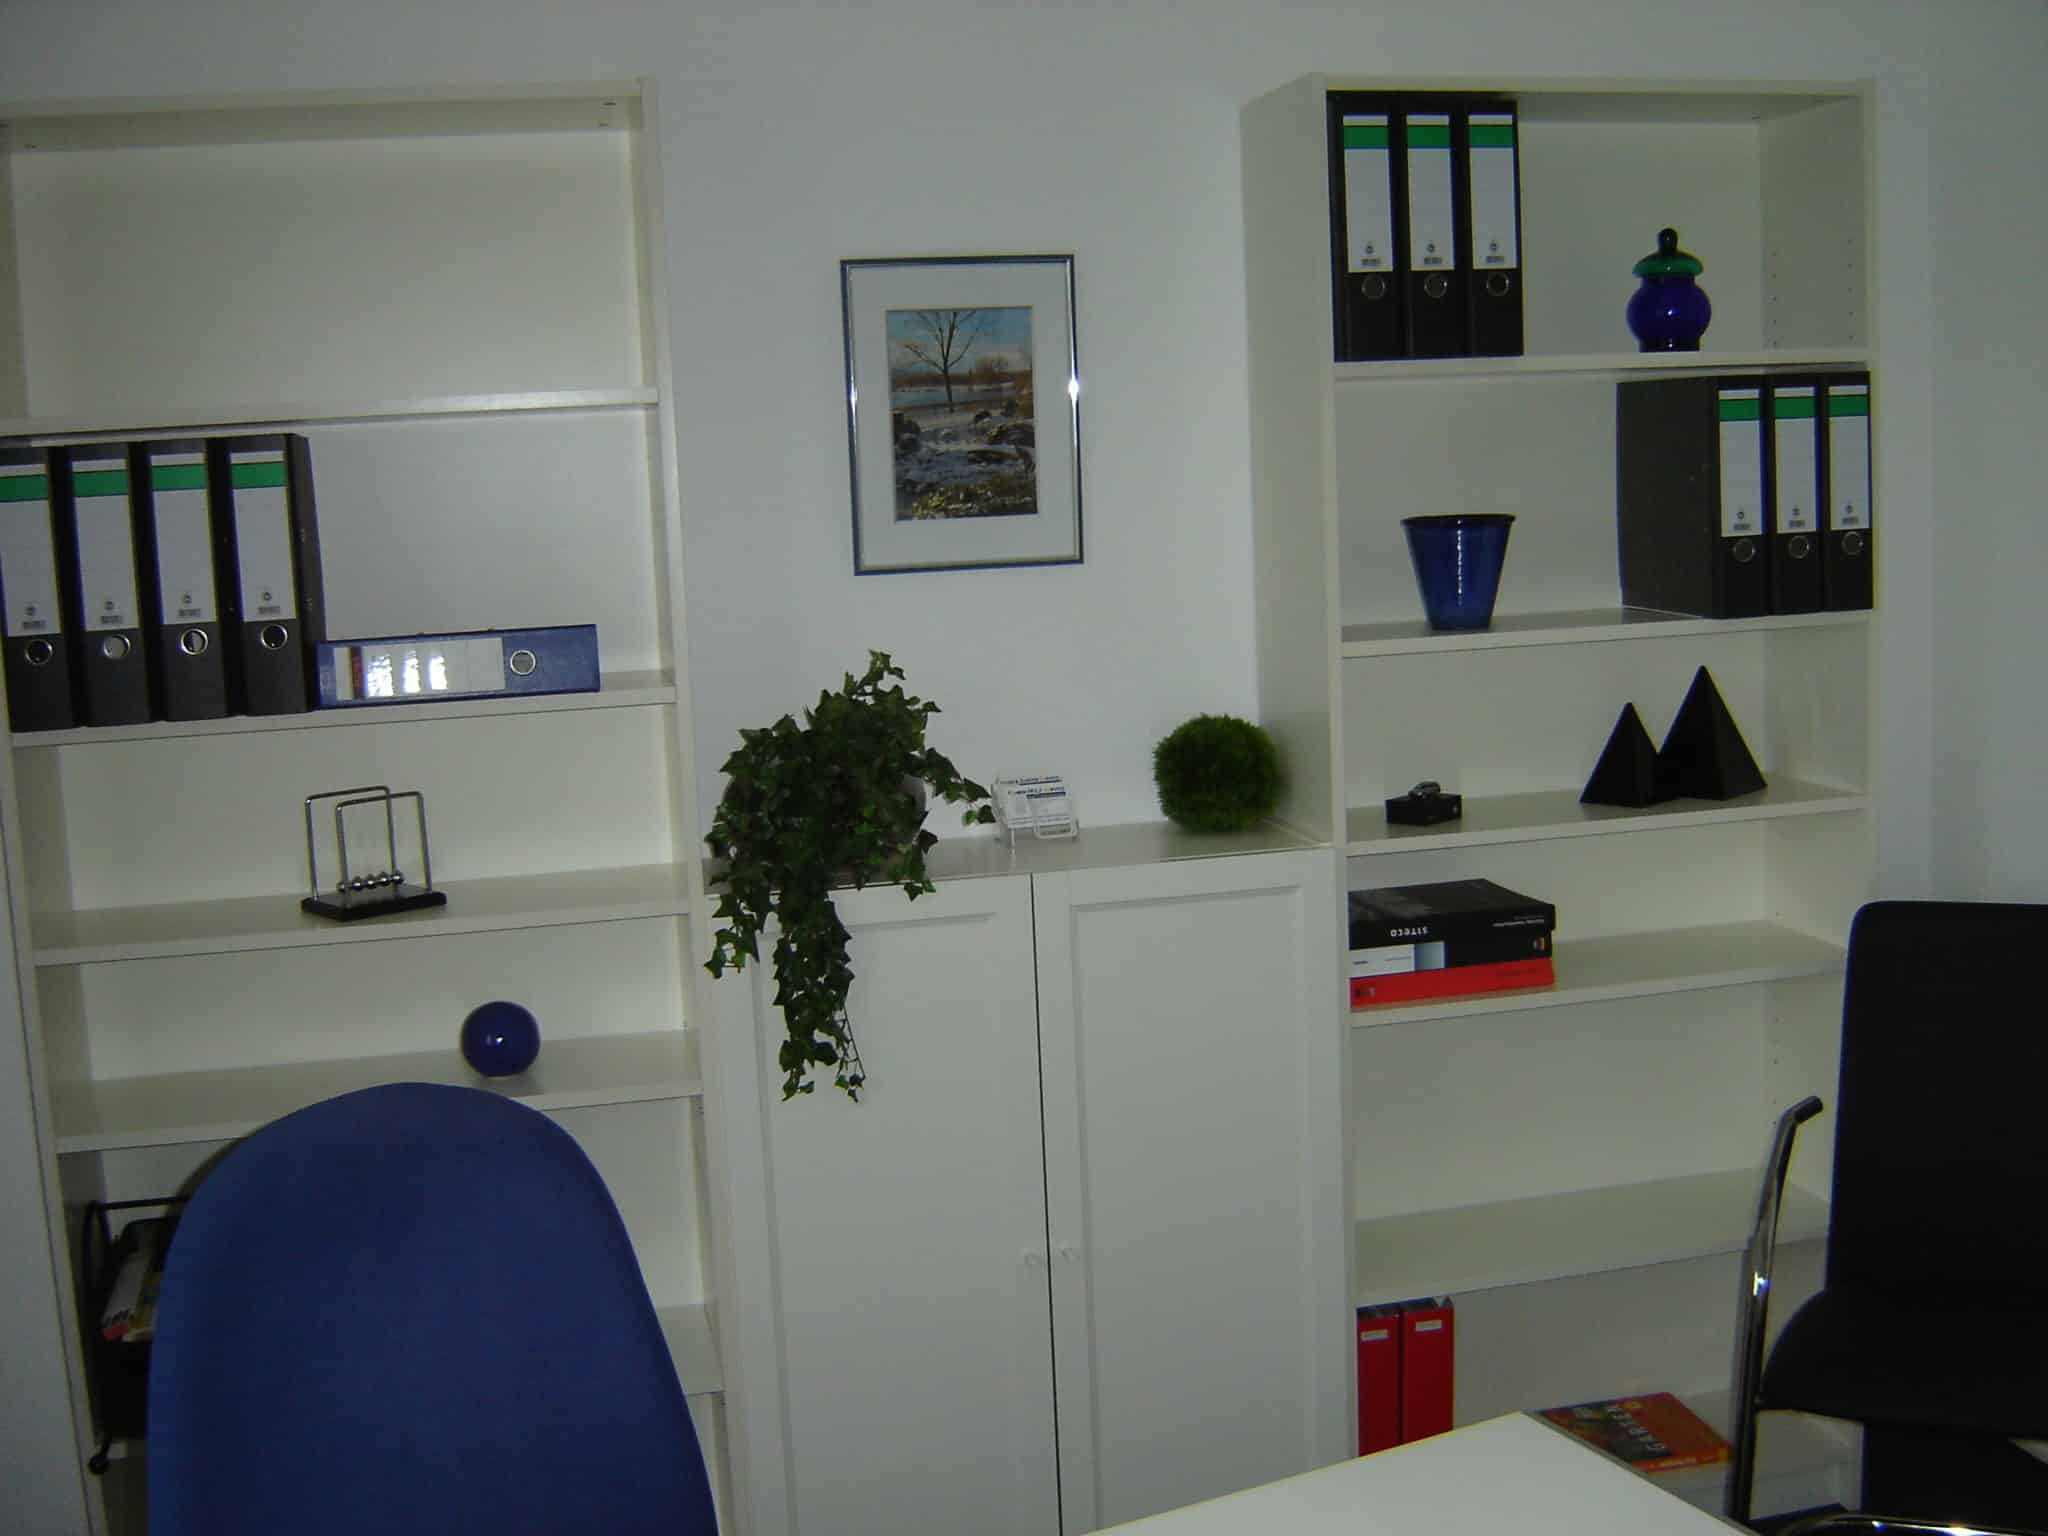 Haus & Garten Service Bad Oeynhausen Assistent der Geschäftsleitung Kaufmännische Assistenz